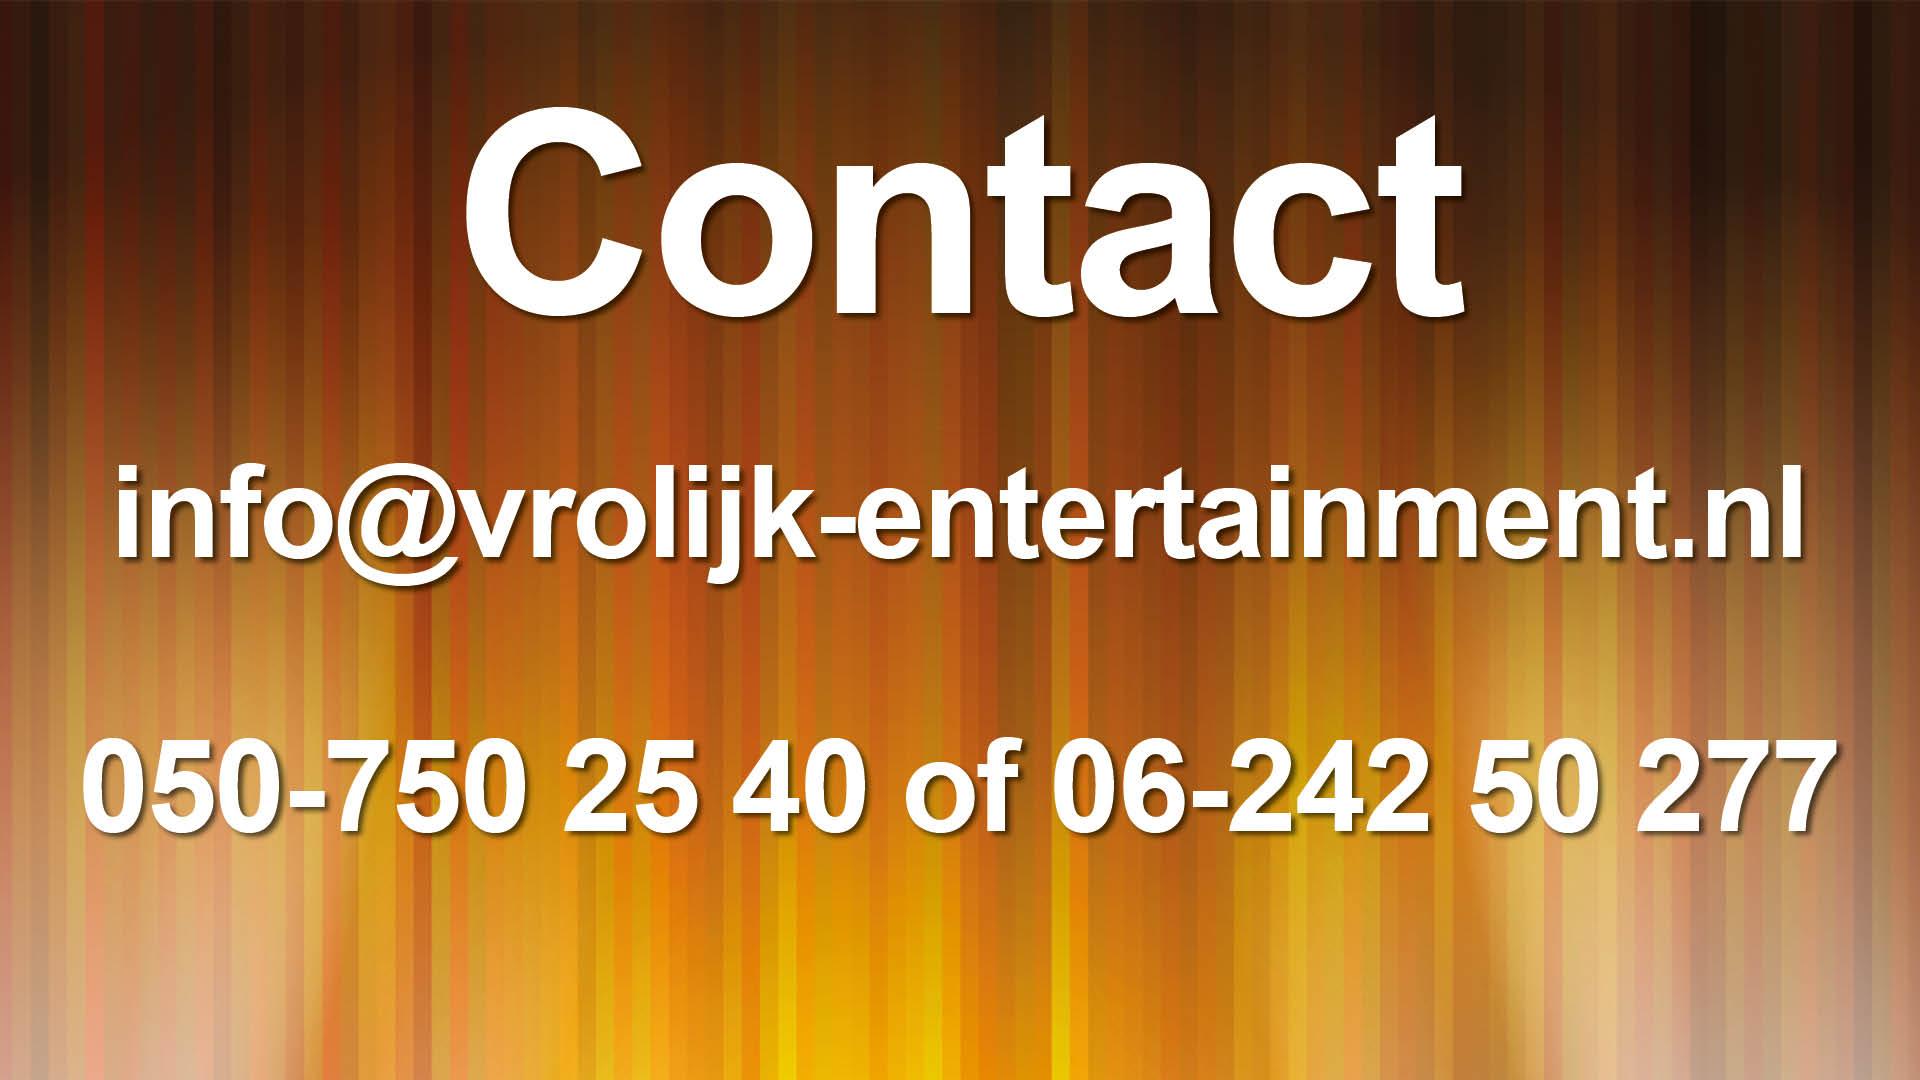 website contact alg